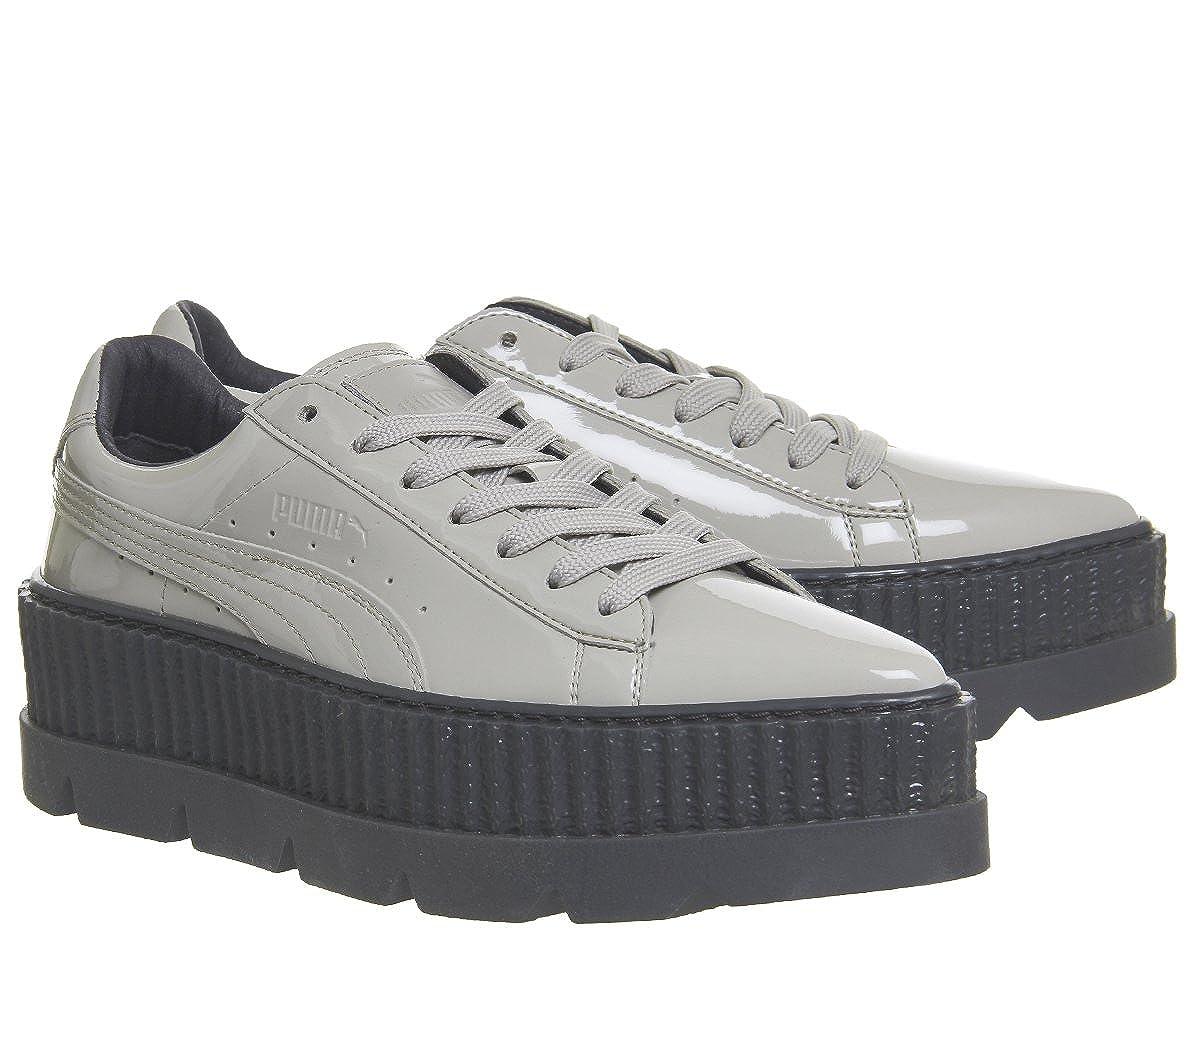 27c63019b16e Puma Fenty Pointy Creeper Dove Patent - 3 UK  Amazon.co.uk  Shoes   Bags